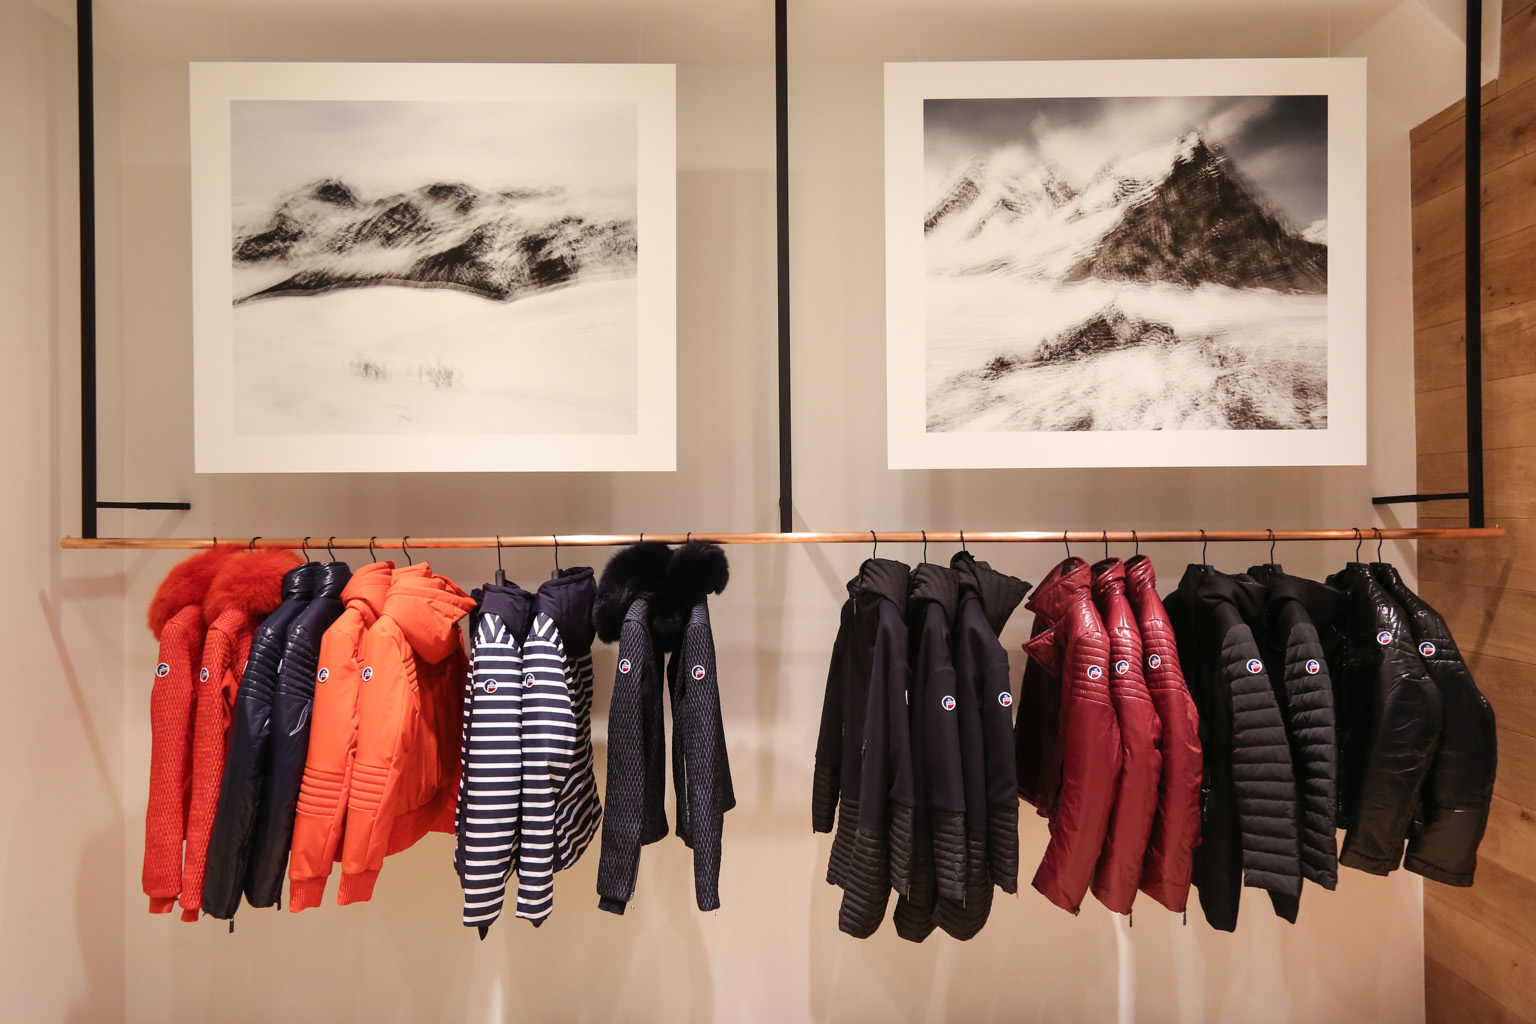 PhotographsofEric Bourret adorn thechalet-likeFusalp boutique.